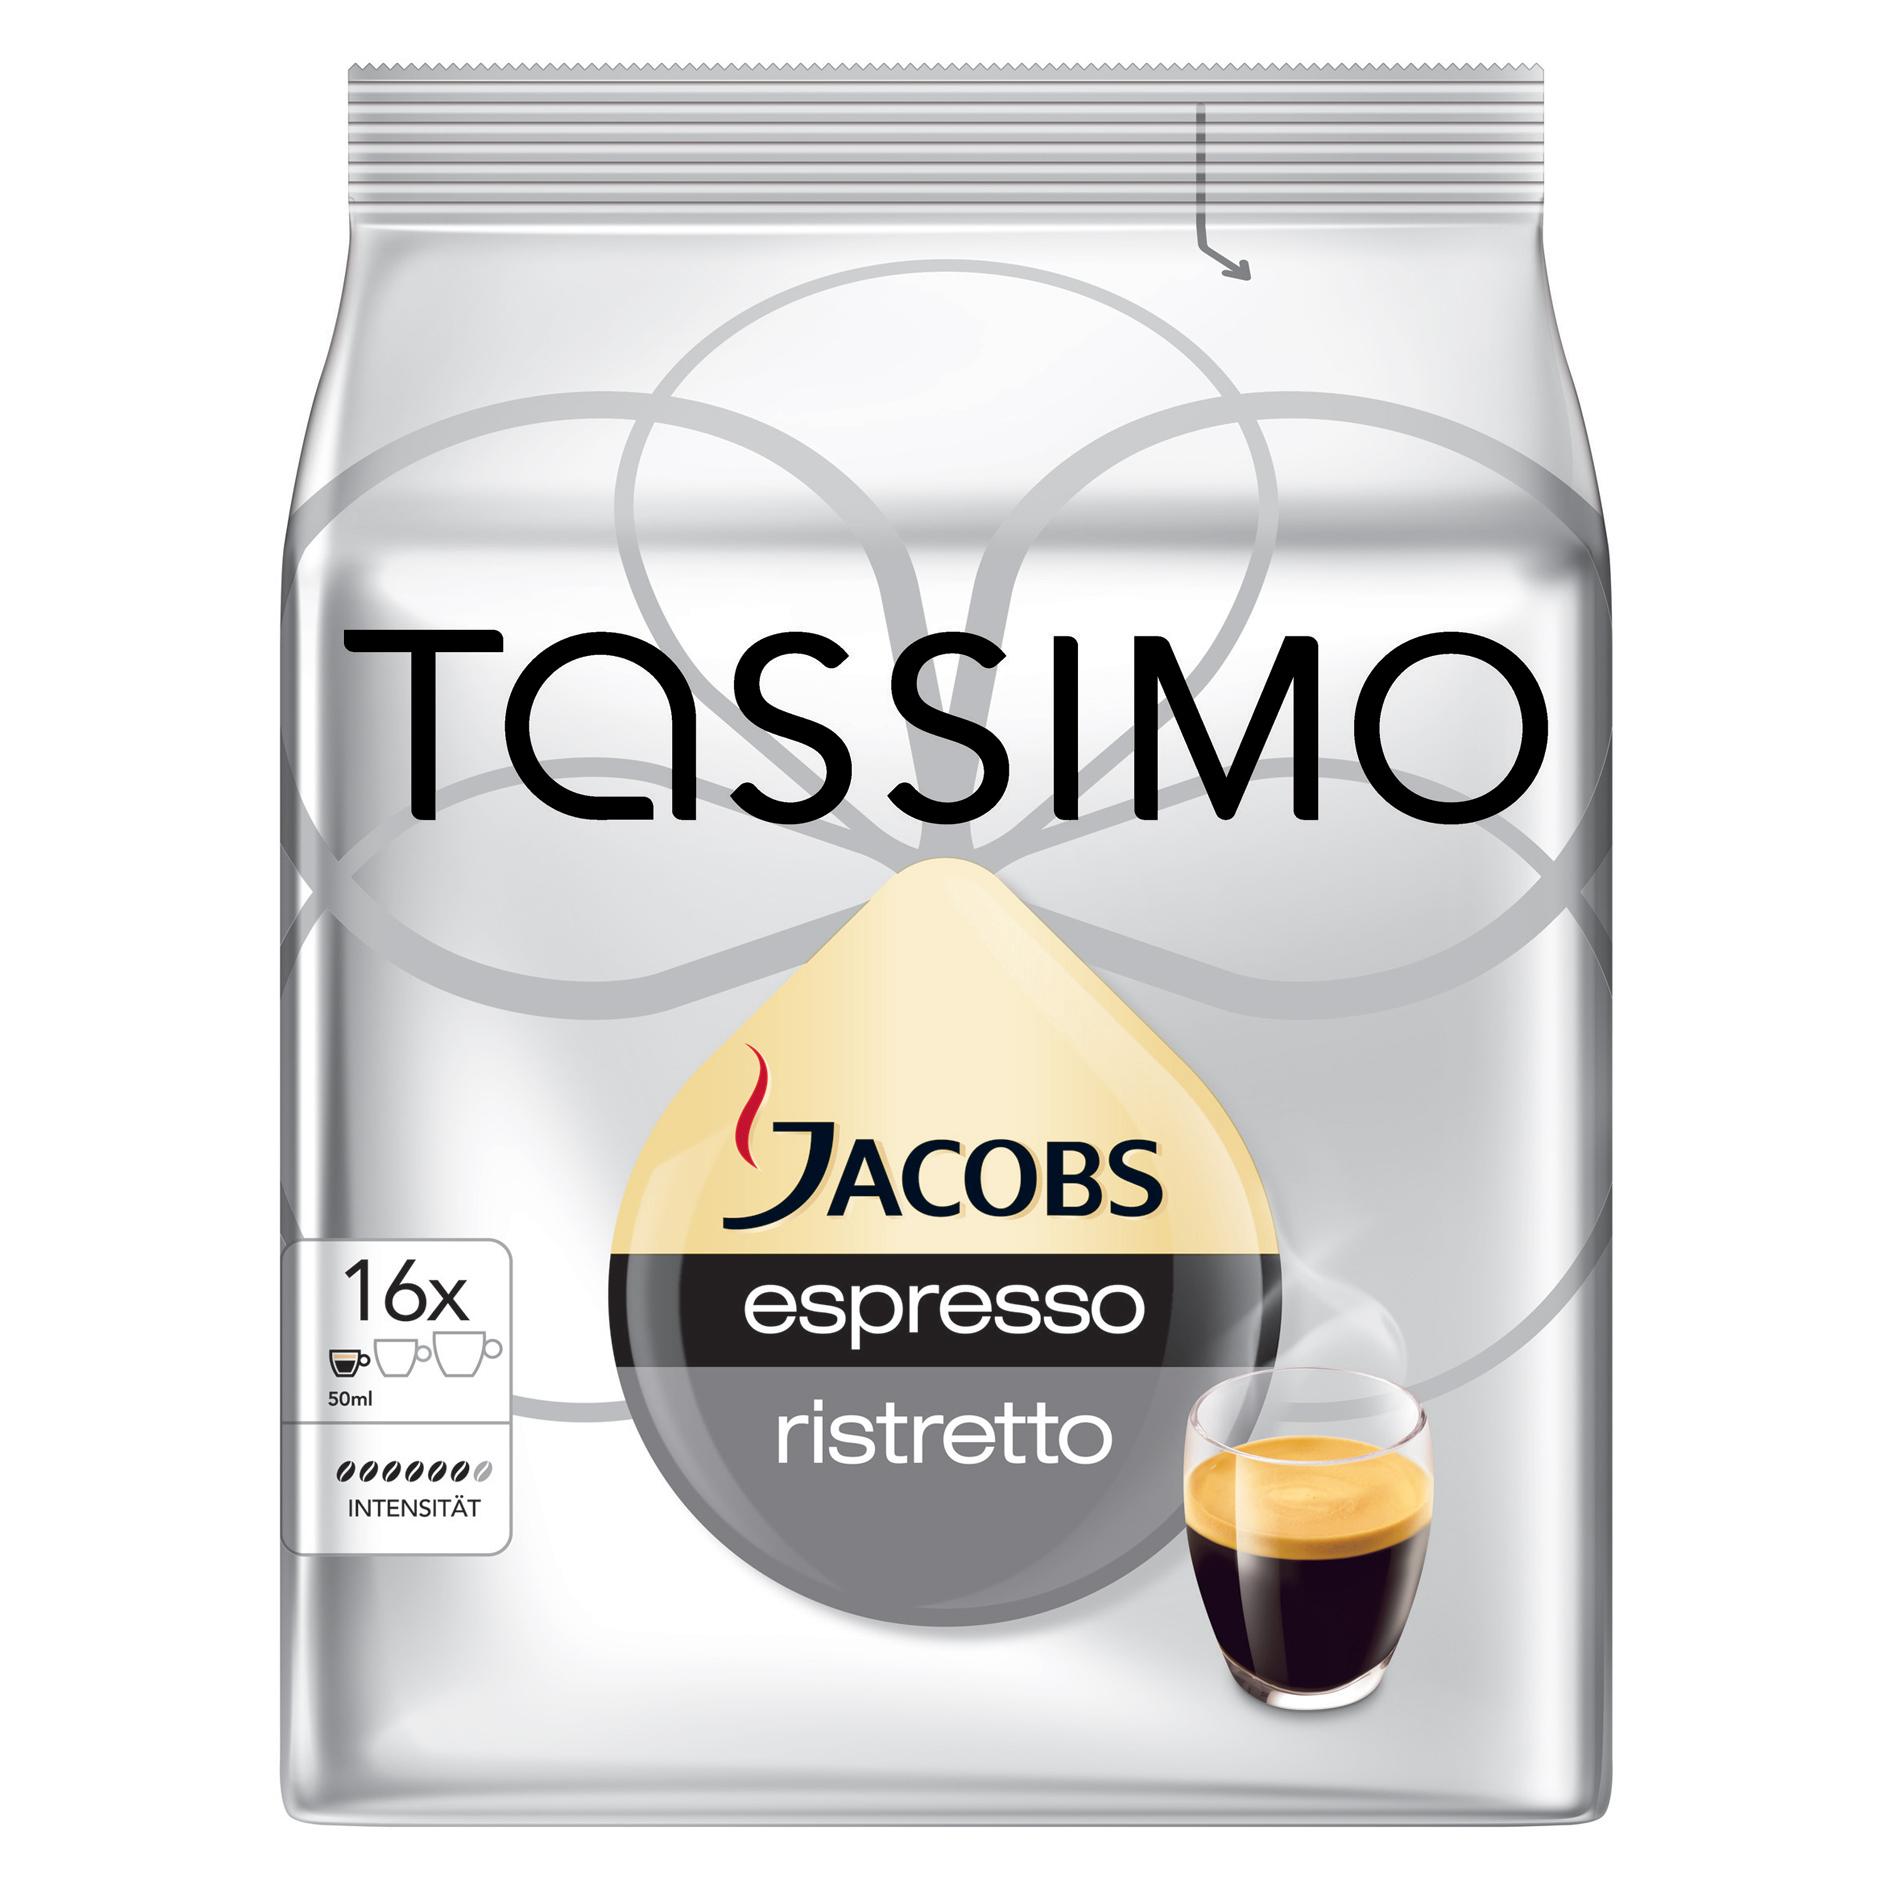 tassimo jacobs espresso ristretto 16x online kaufen im. Black Bedroom Furniture Sets. Home Design Ideas